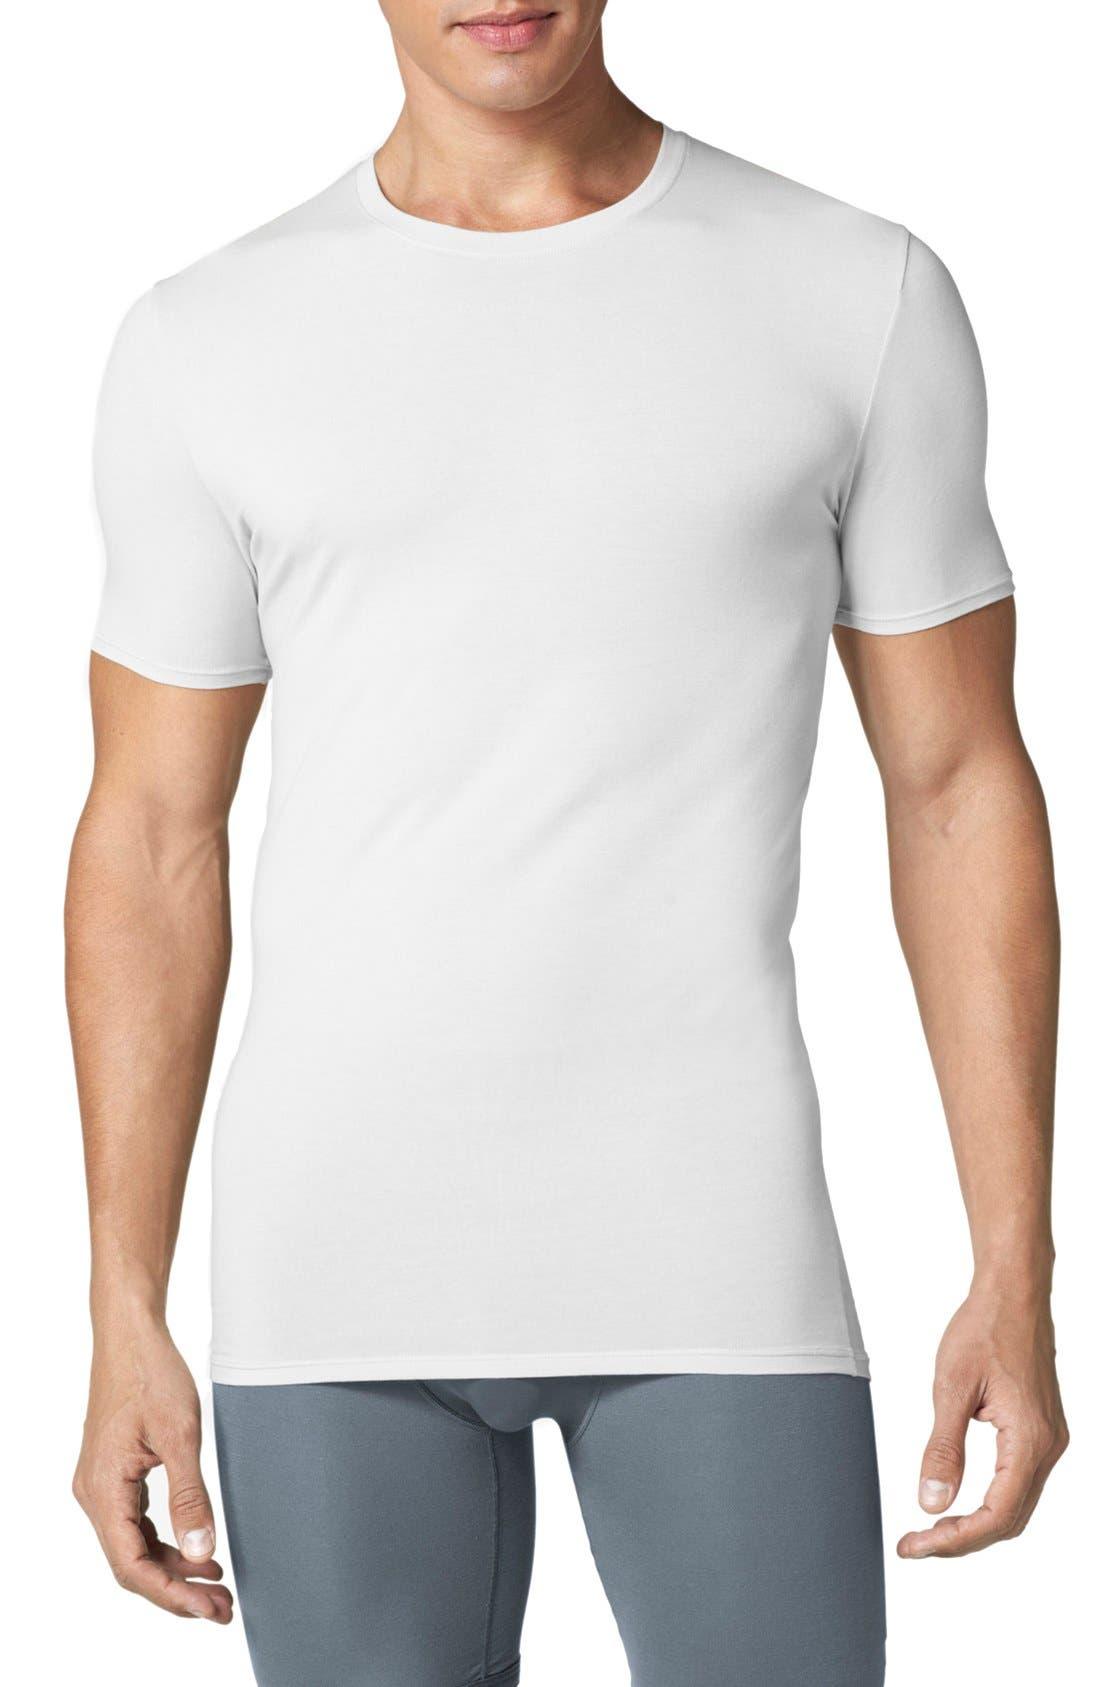 Main Image - Tommy John 'Second Skin' Crewneck Undershirt